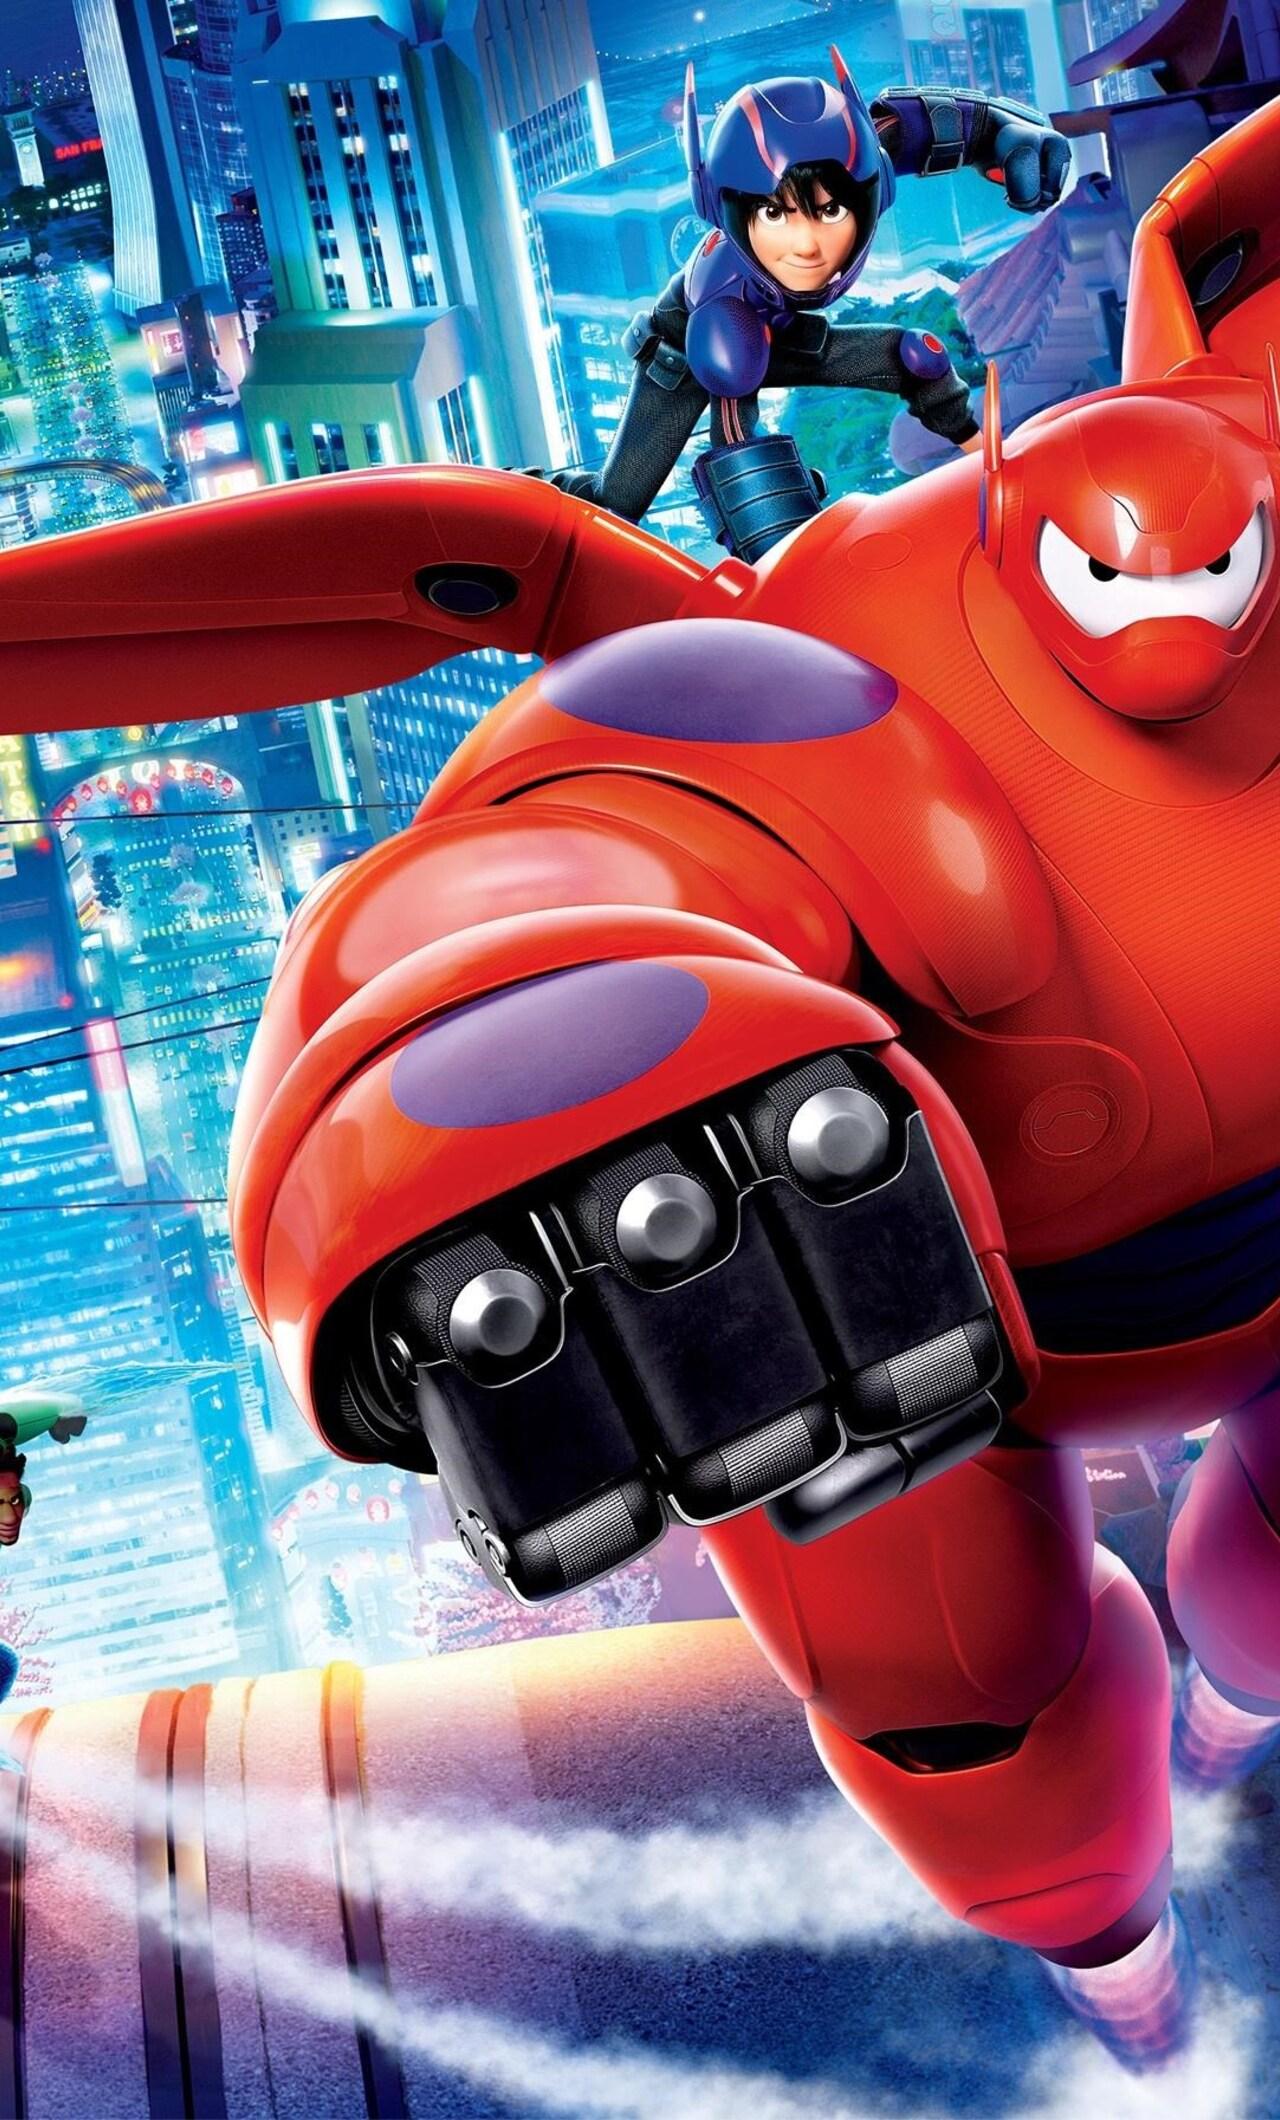 1280x2120 Big Hero 6 Movie Hd Iphone 6 Hd 4k Wallpapers Images